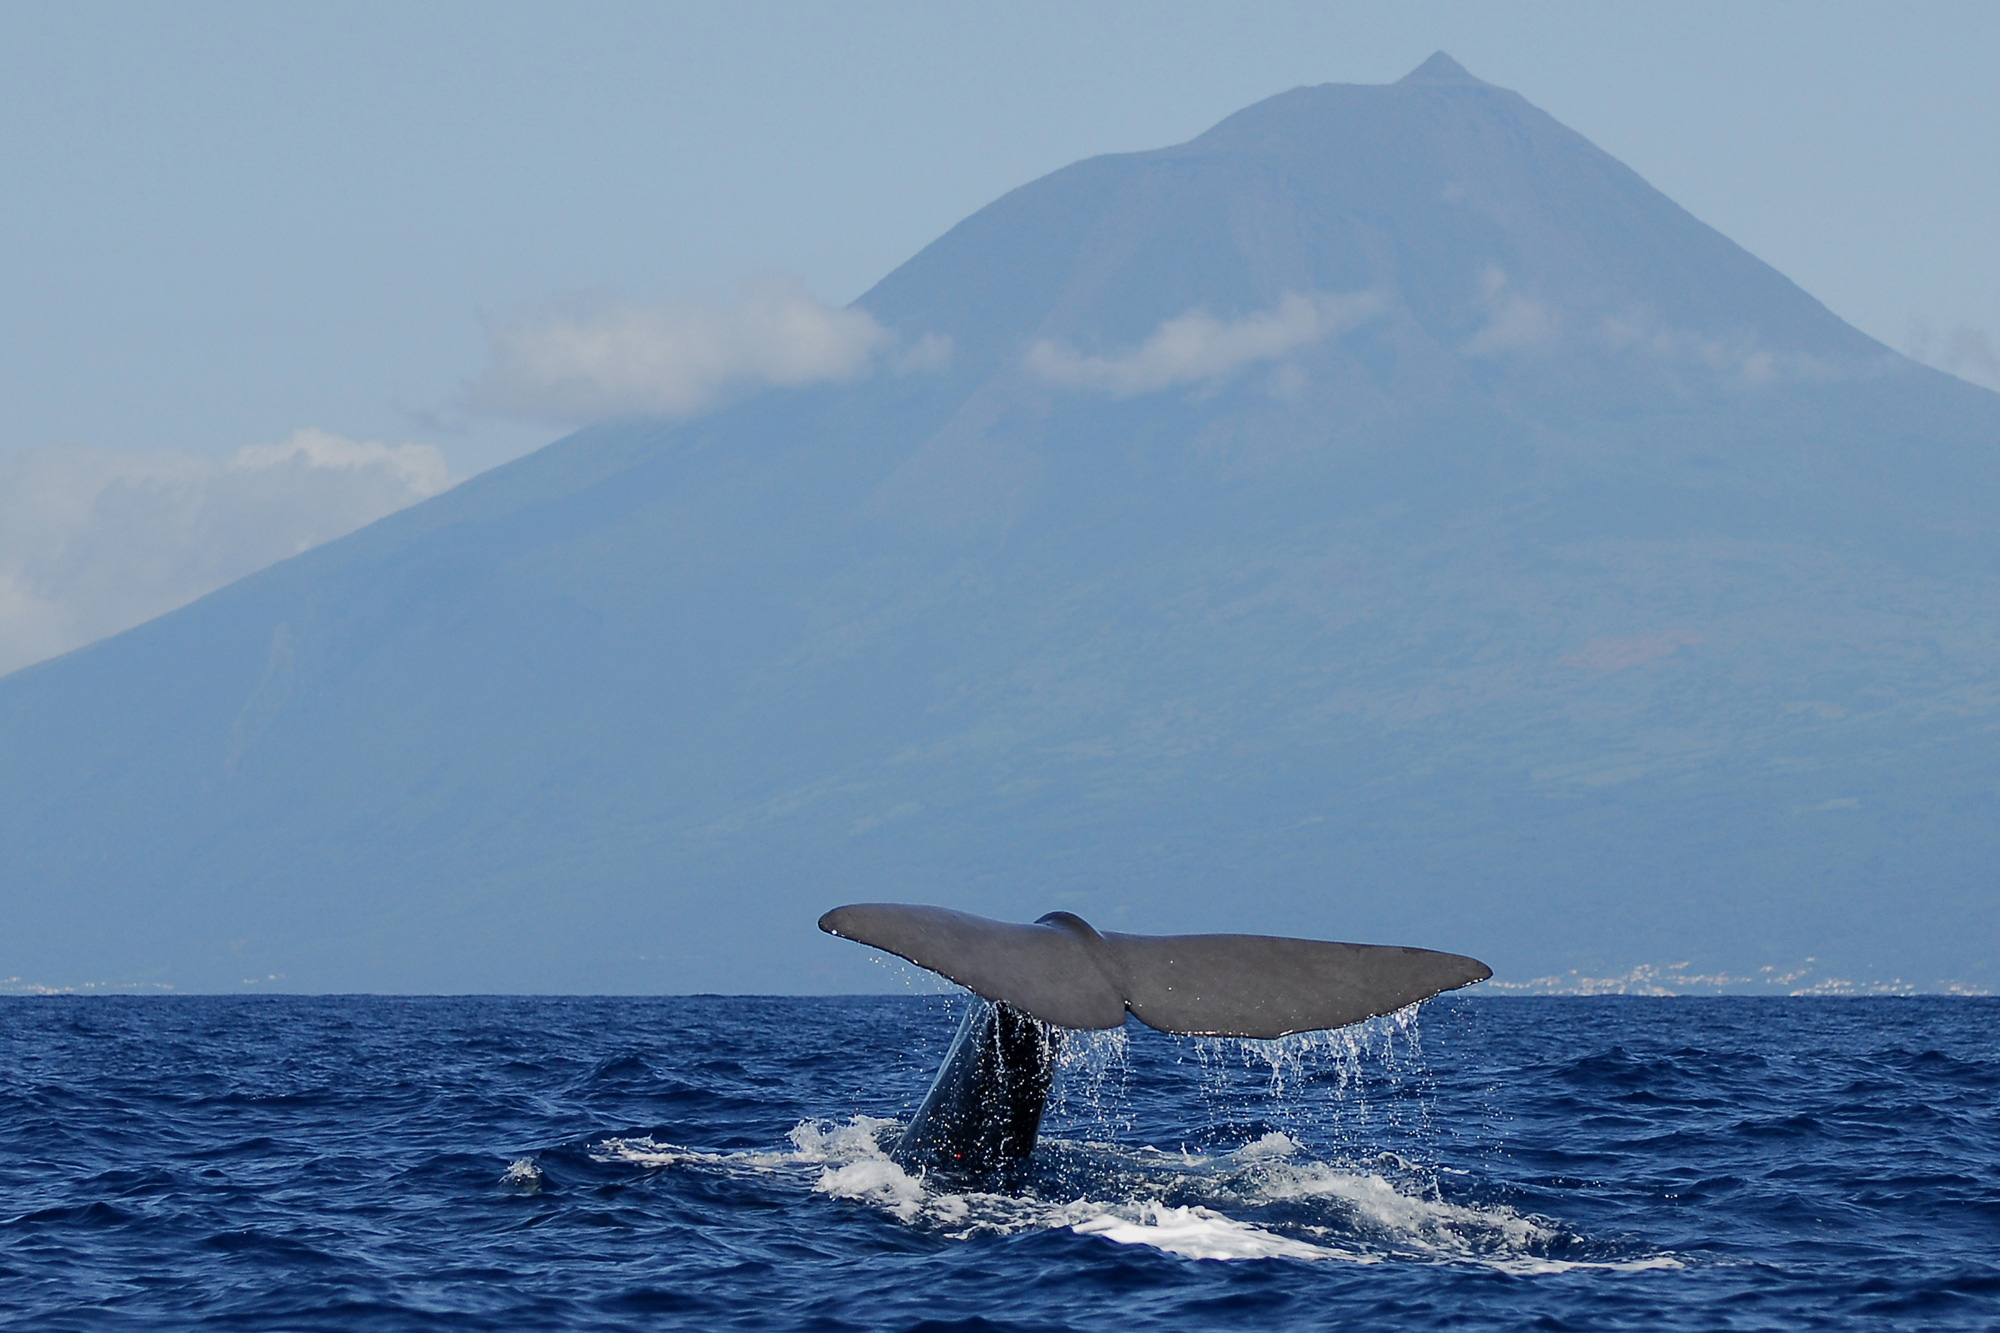 azores pico island sperm whale tail